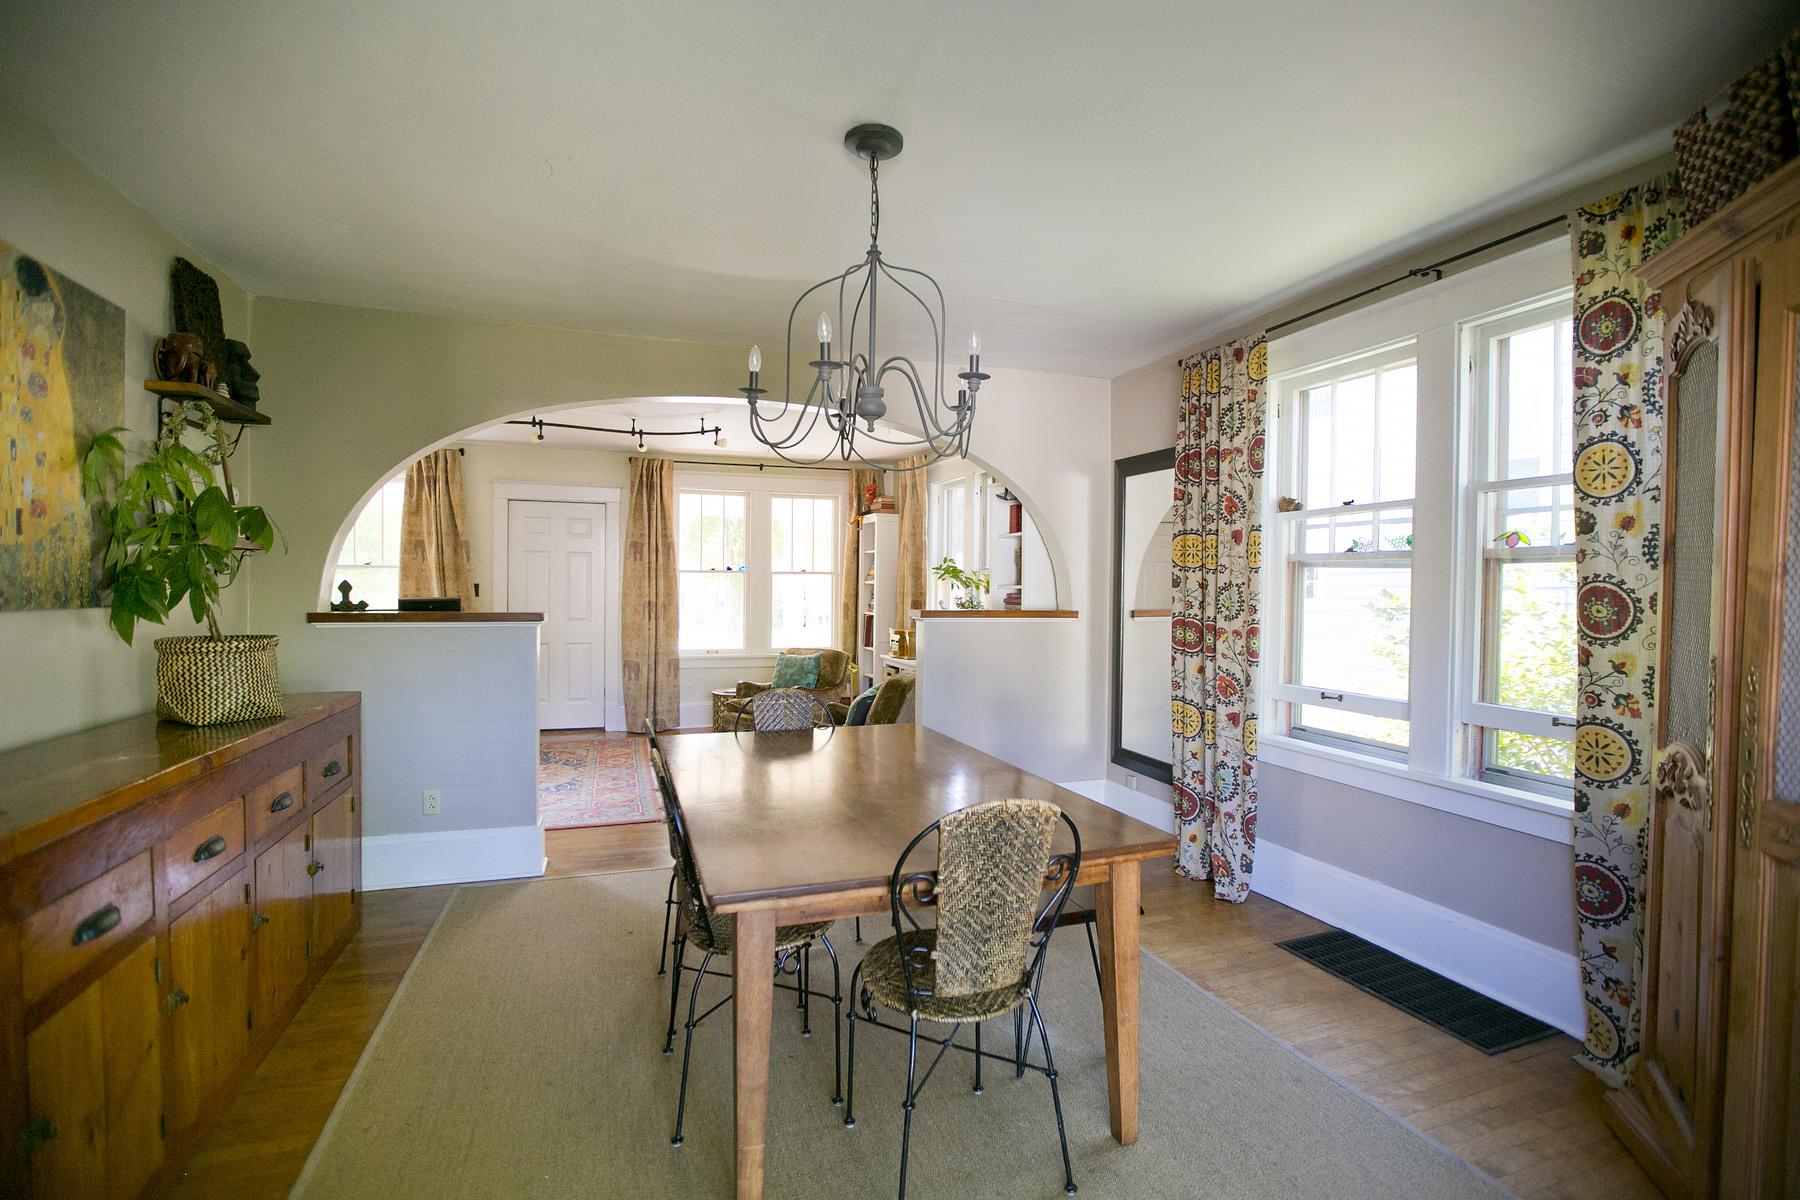 Home Interior - Pakala Painting